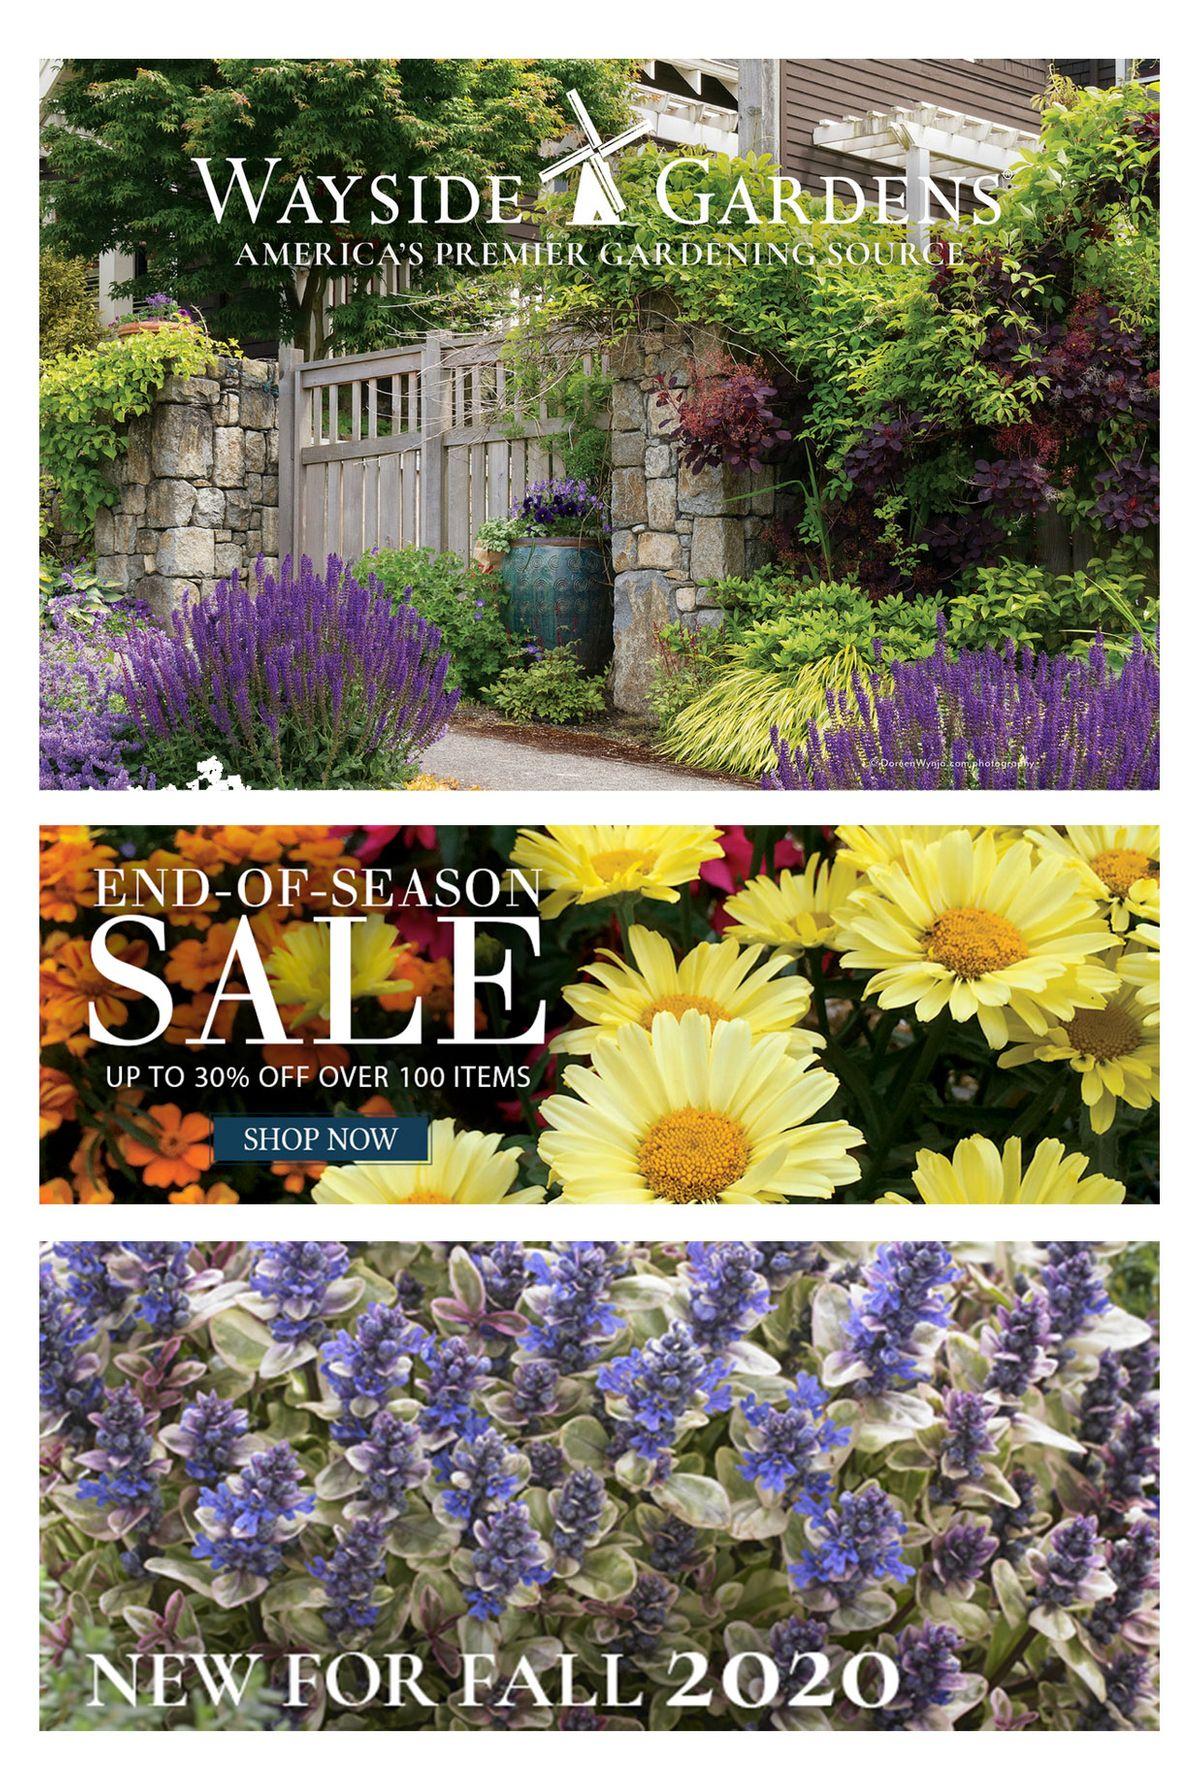 Wayside Gardens - J&P Park Acquisitions